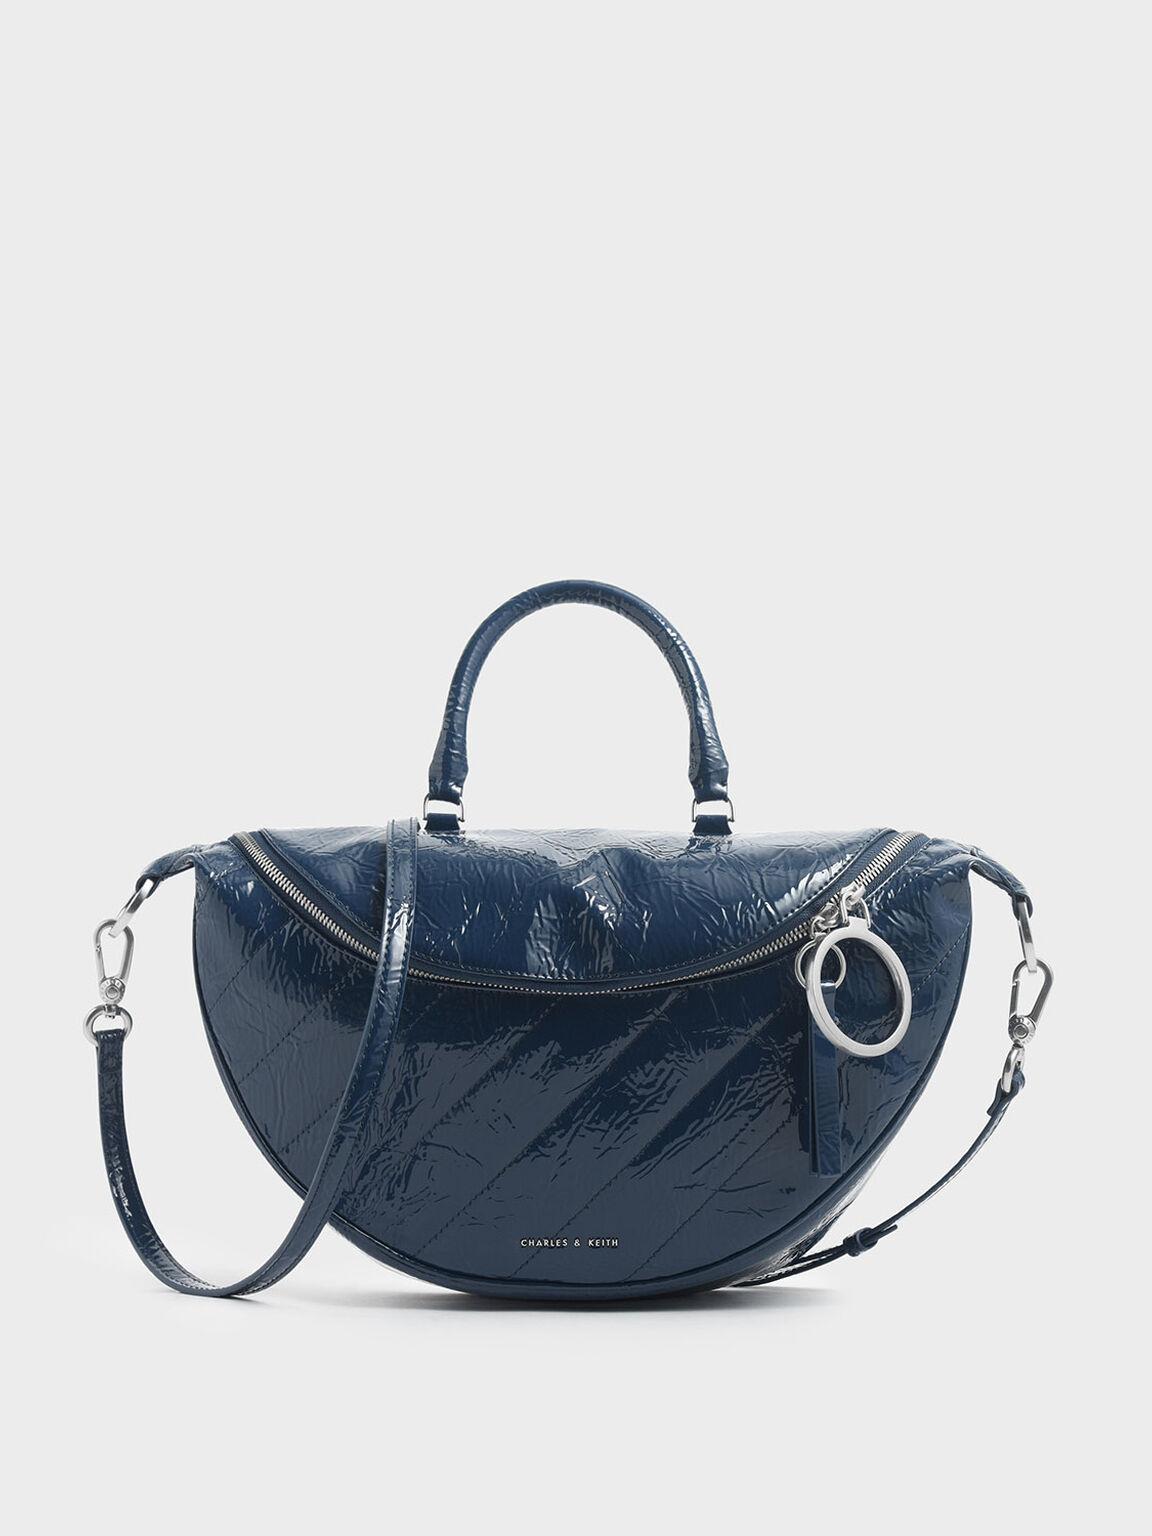 Wrinkled Patent Large Semi-Circle Crossbody Bag, Blue, hi-res